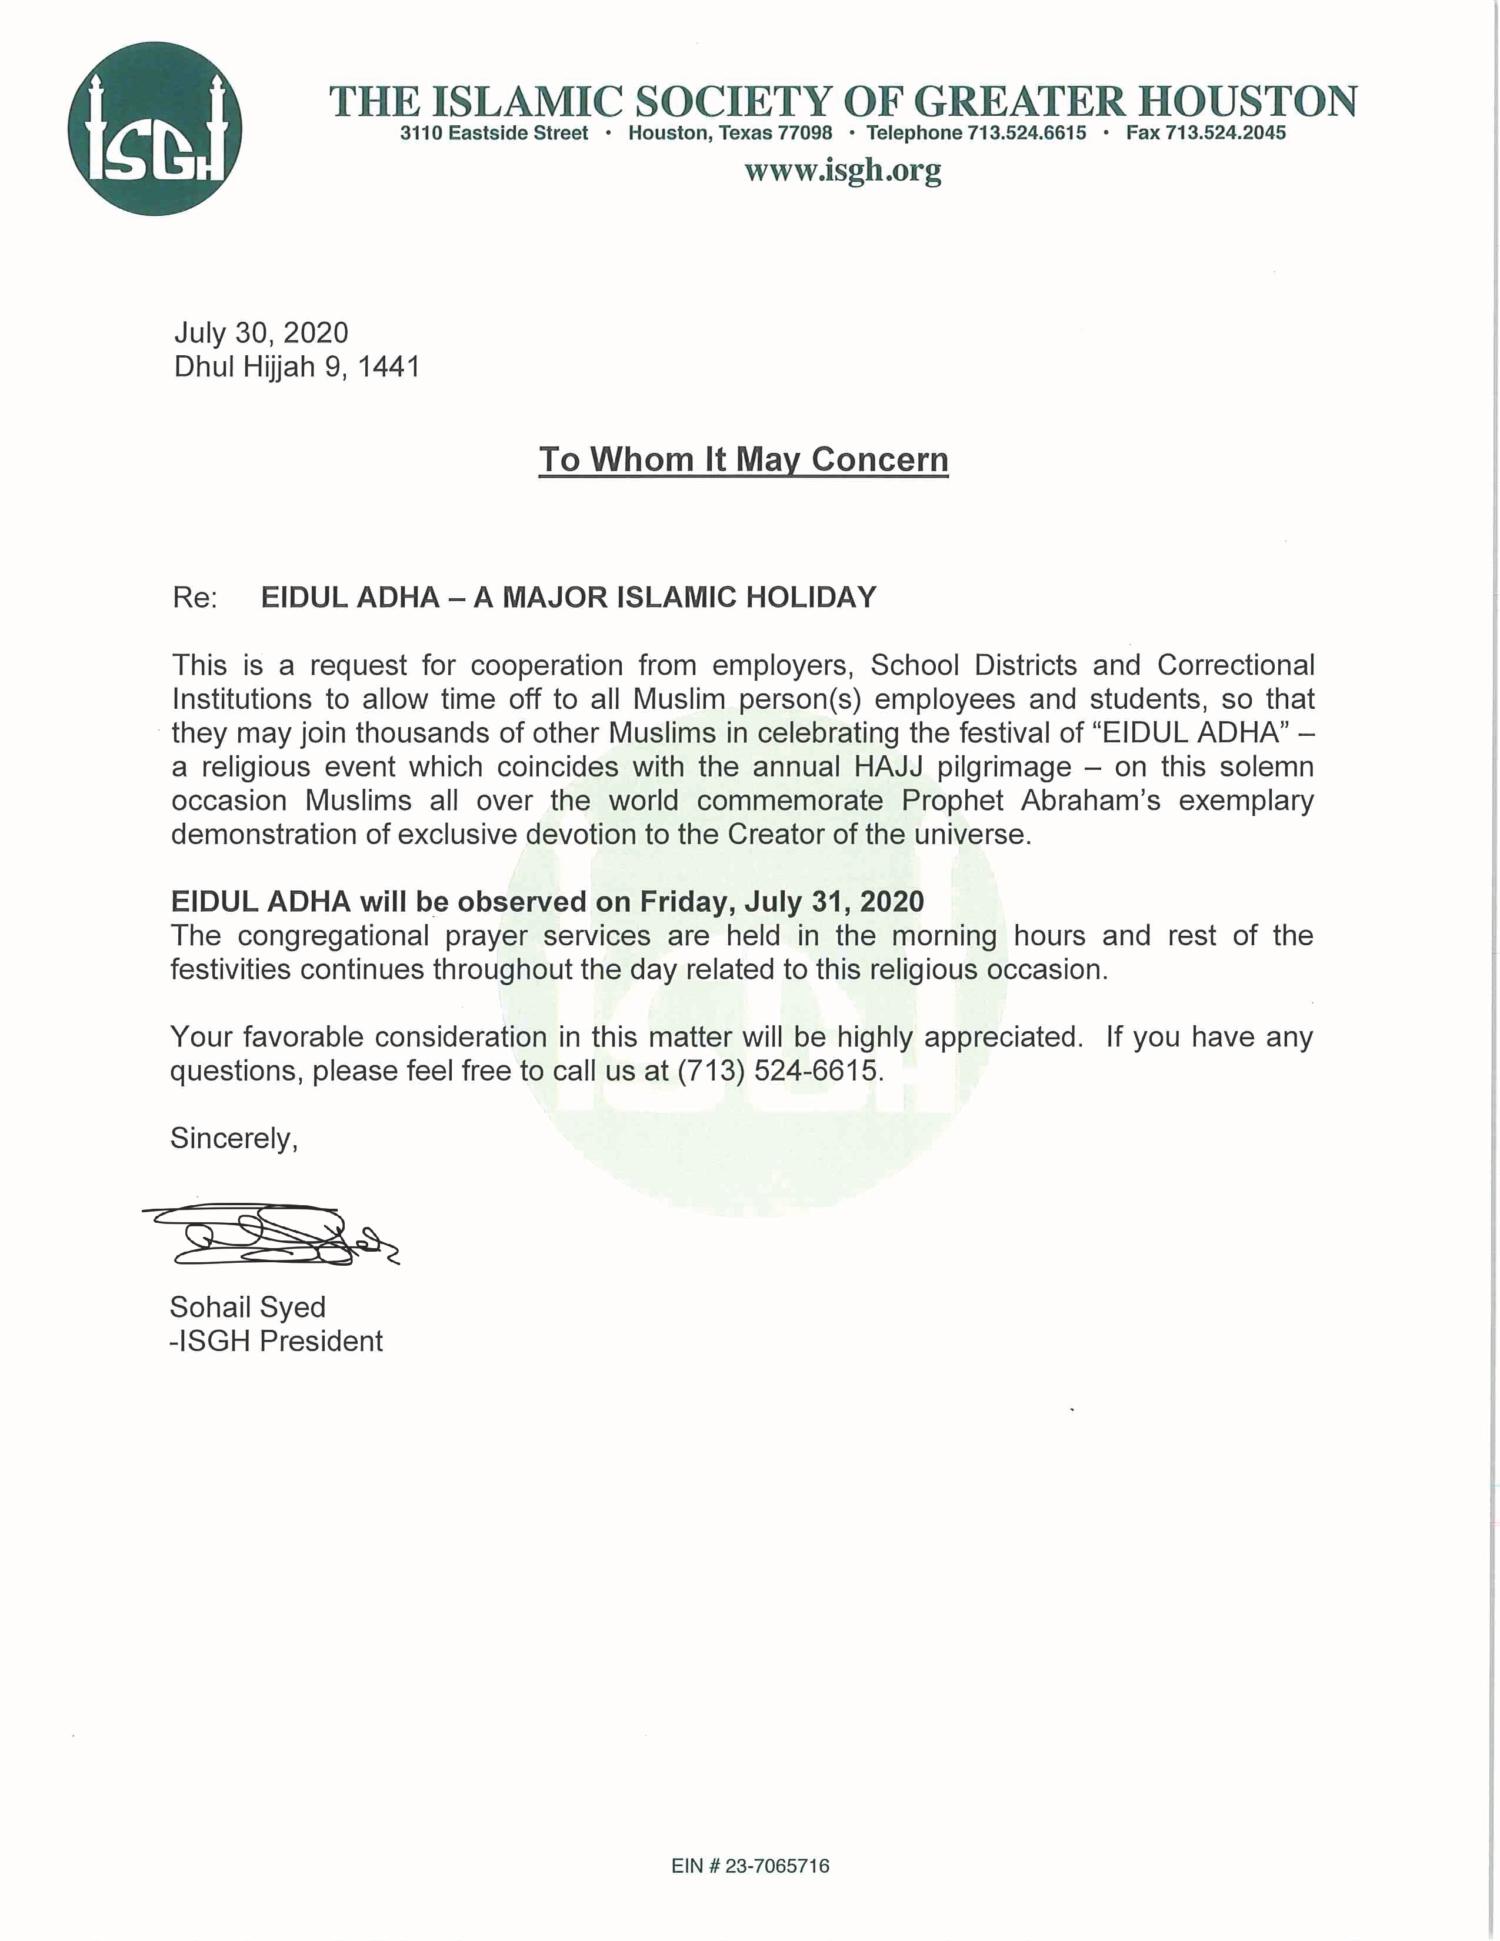 Eid Al Adha Excuse Letter Islamic Society Of Greater Houston